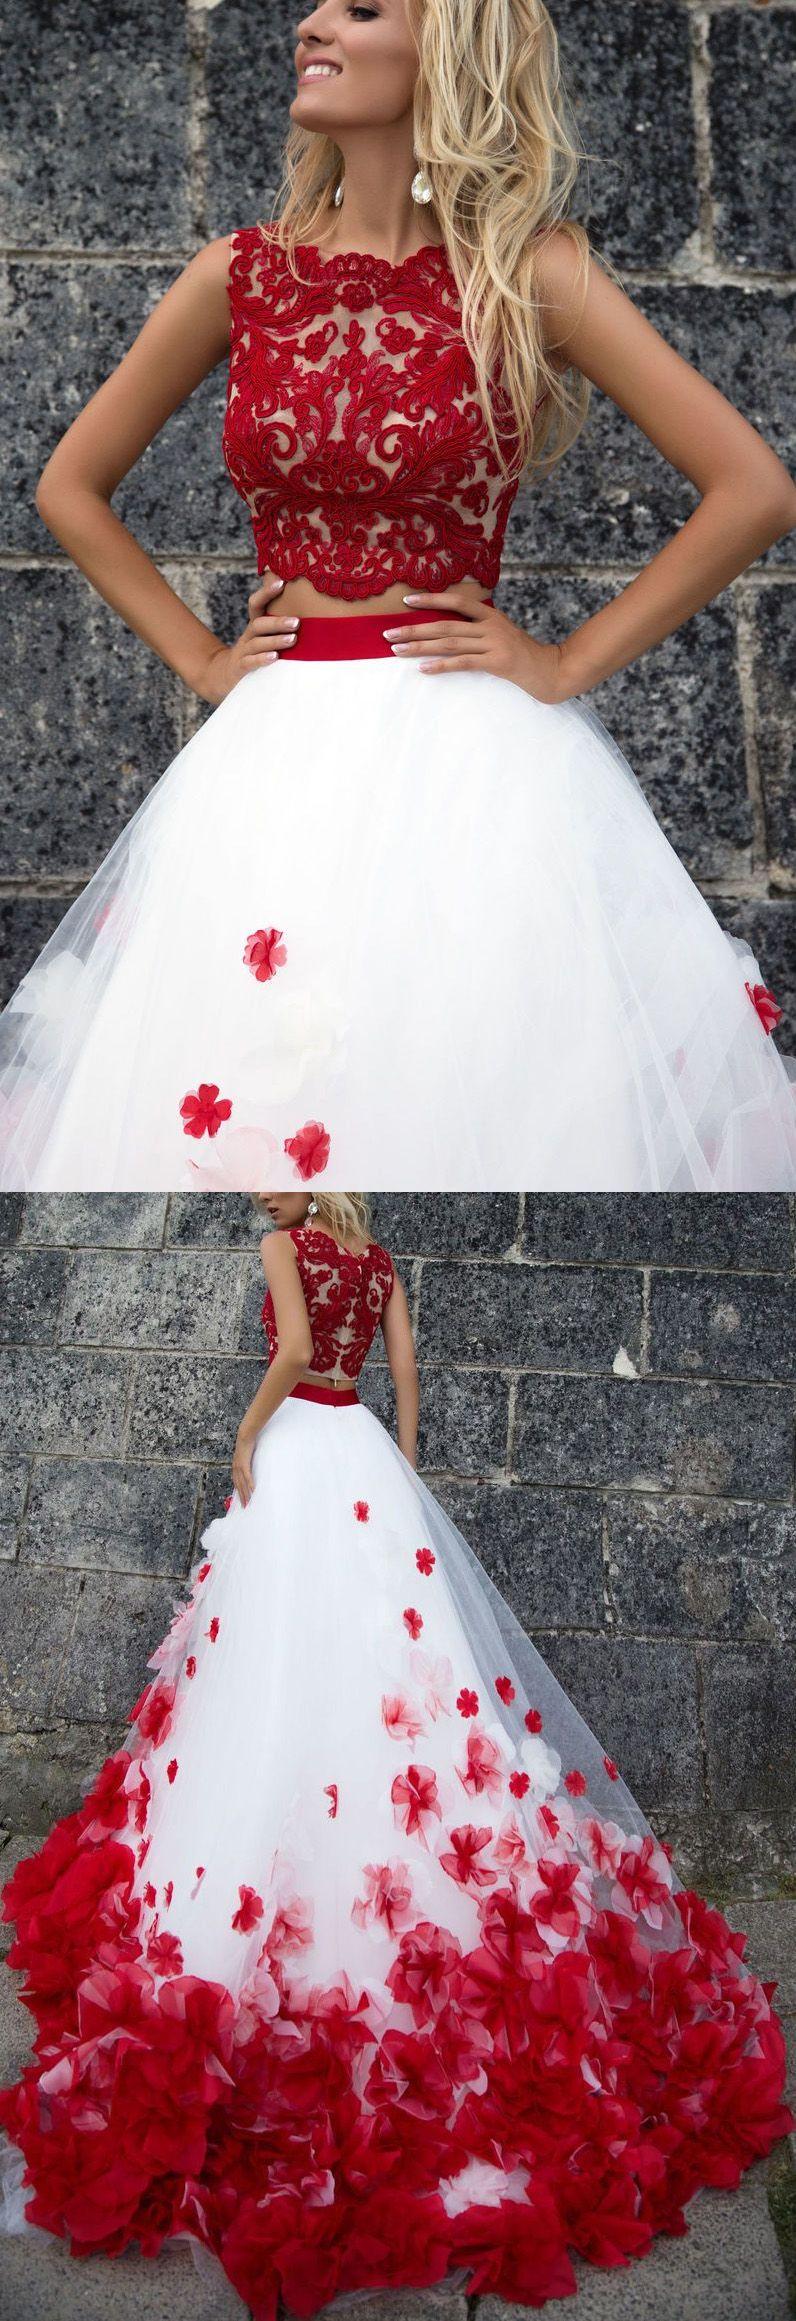 Wedding and bridal dresses red wedding dresses bridal wedding